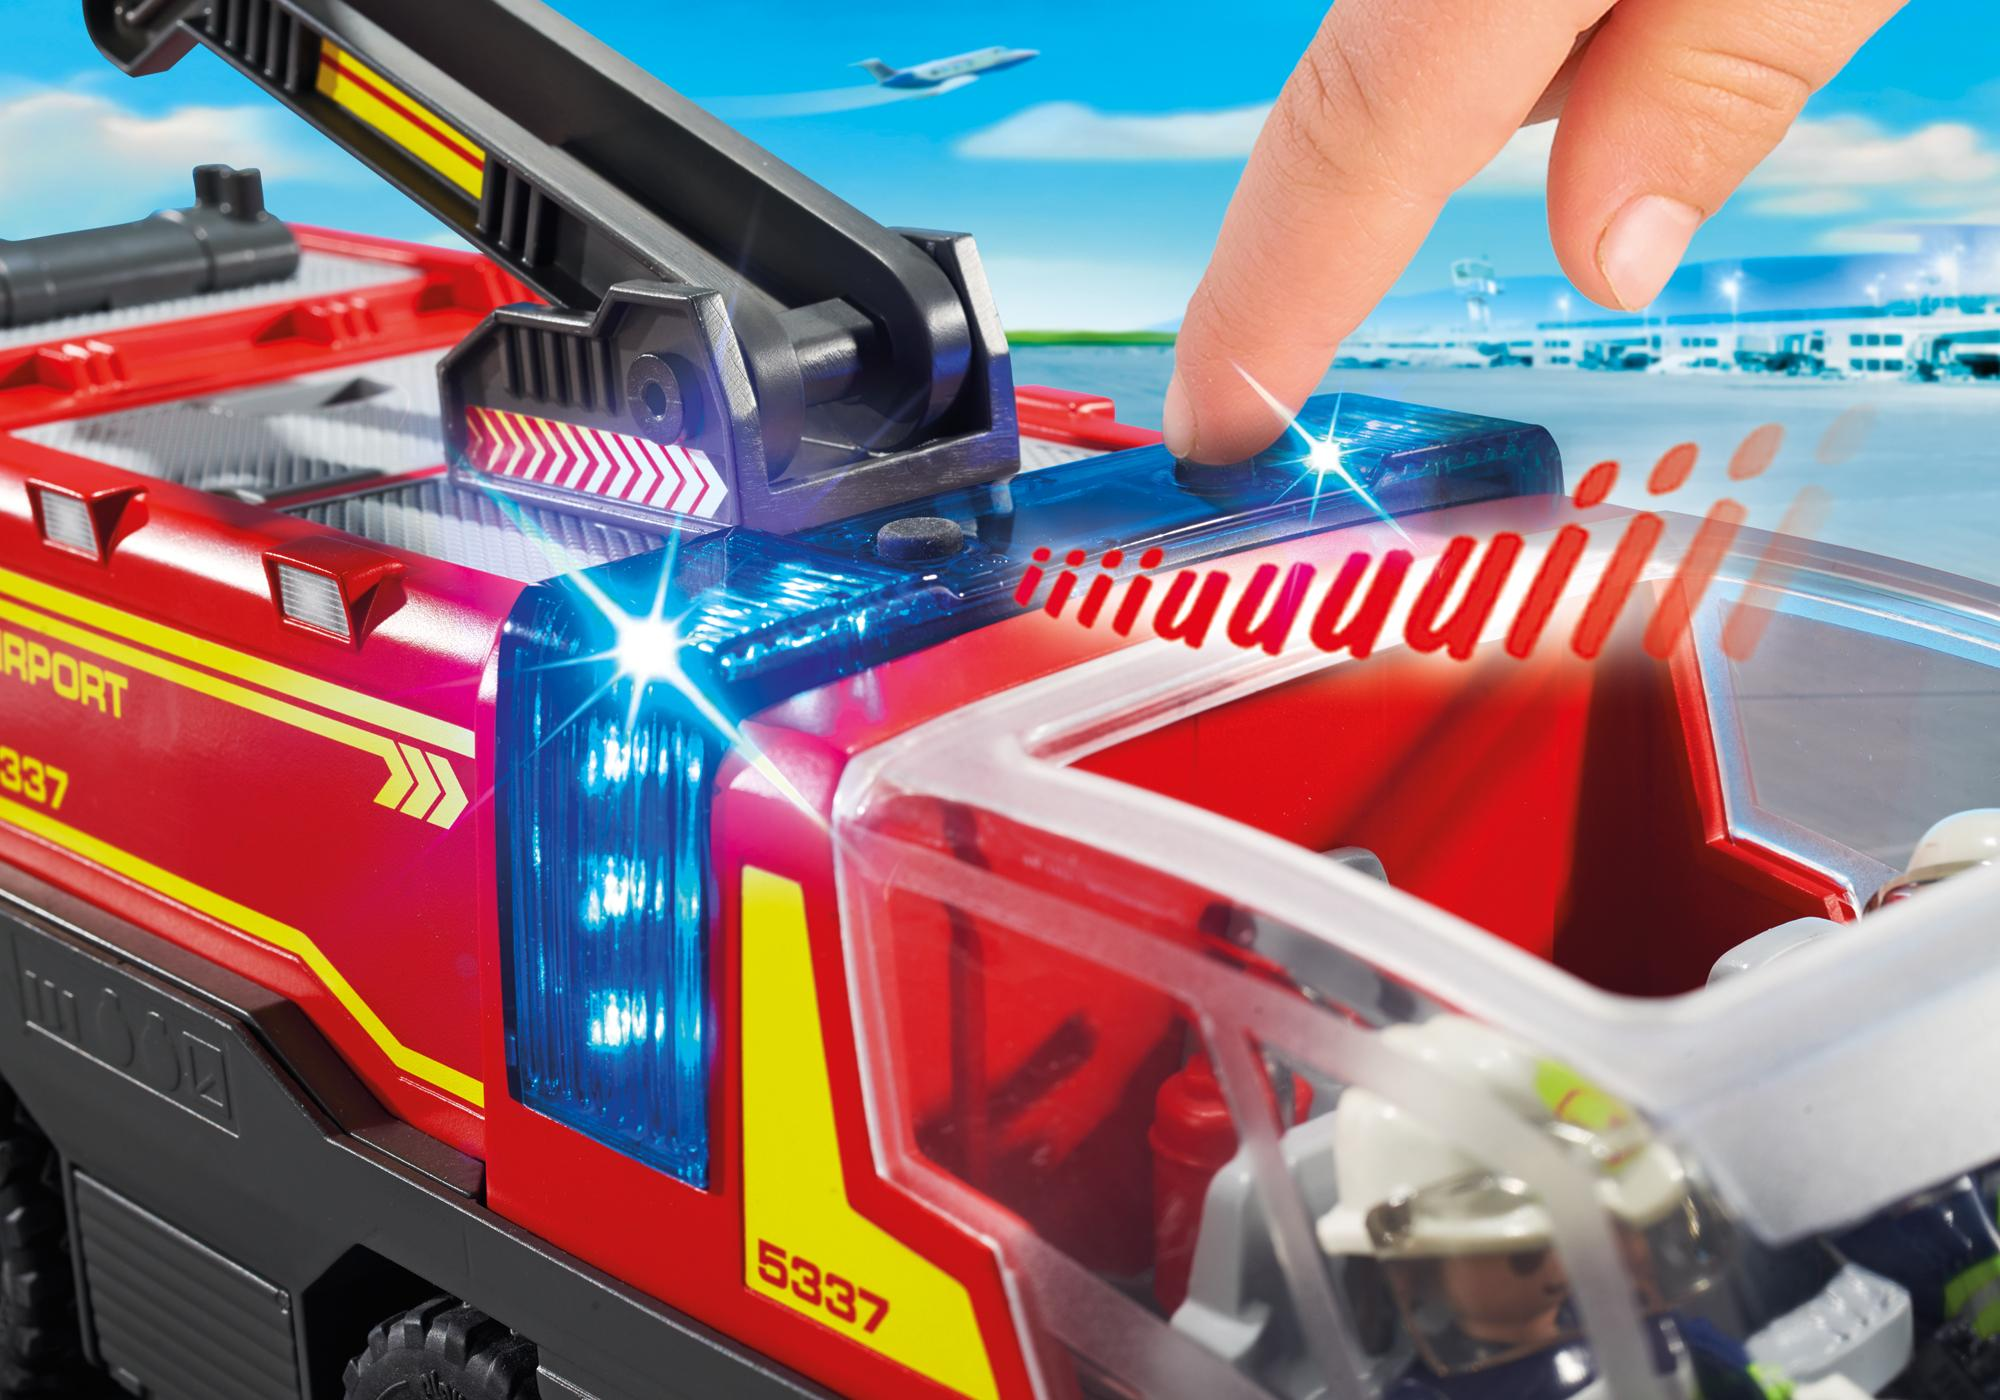 http://media.playmobil.com/i/playmobil/5337_product_extra1/Πυροσβεστικό όχημα αεροδρομίου με φώτα και ήχο